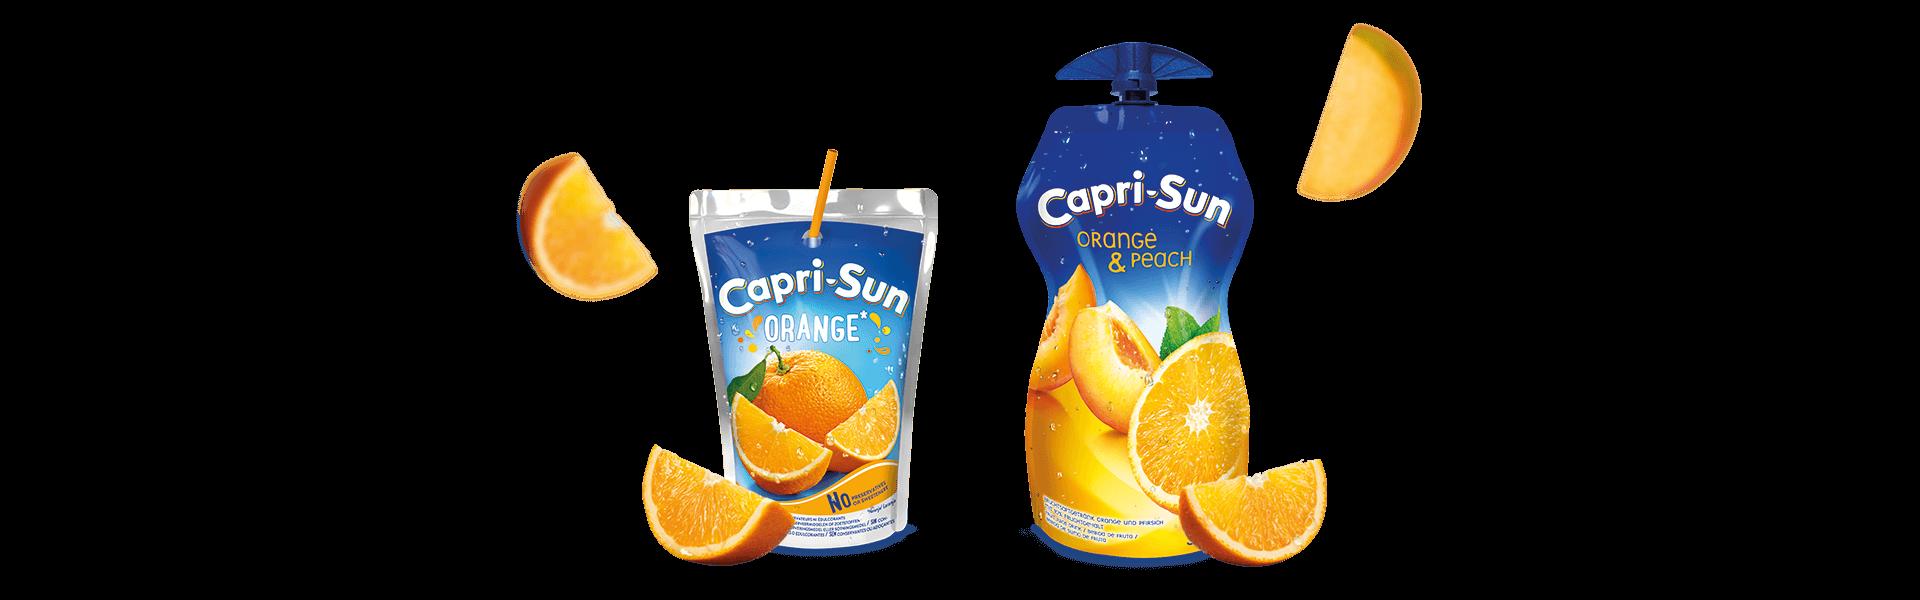 Capri-Sun Orange 200ml 200ml and Orange and Peach 330ml with flying fruits